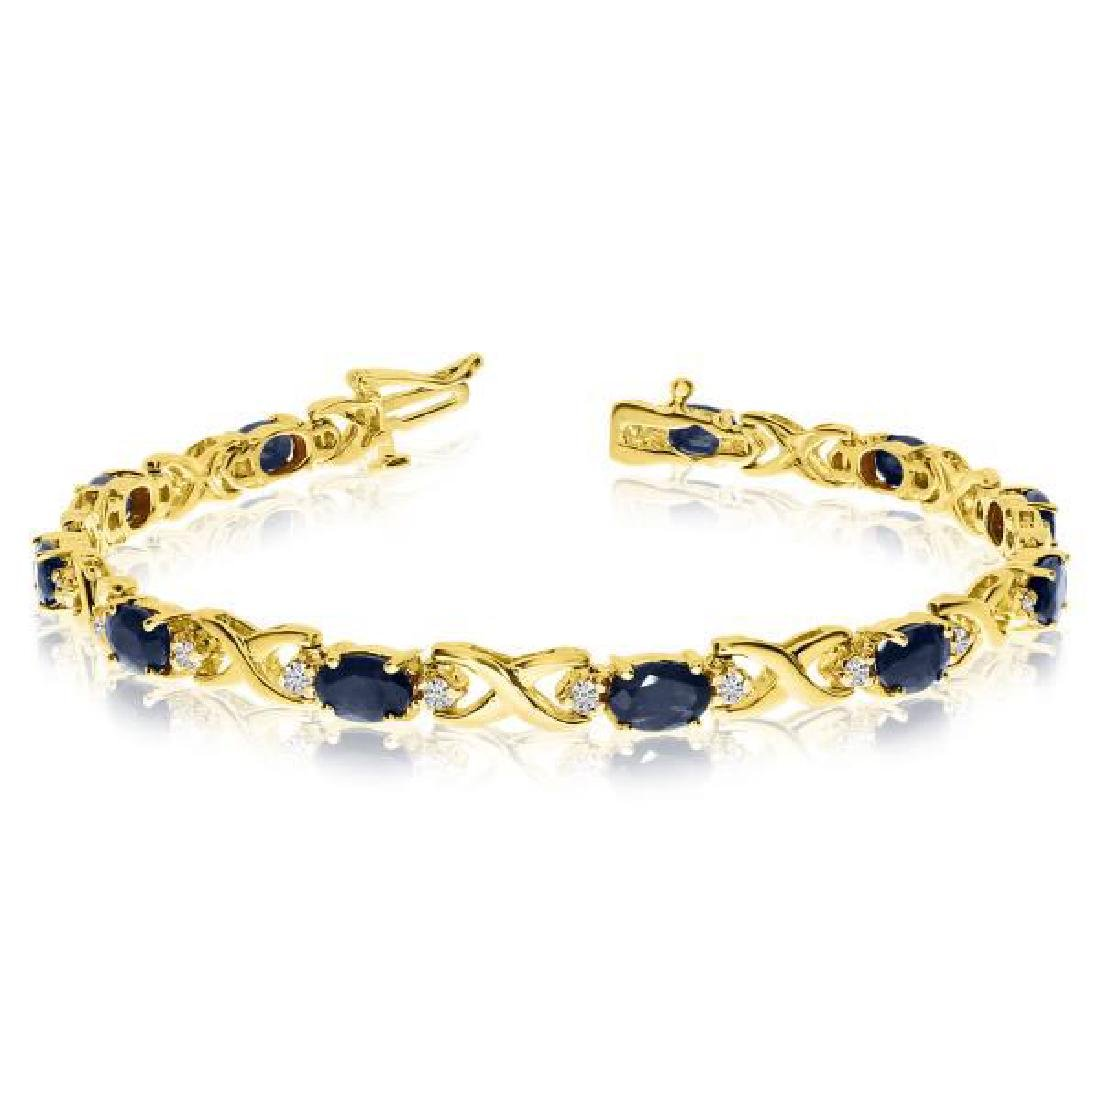 Oval Sapphire and Diamond XOXO Link Bracelet 14k Yellow